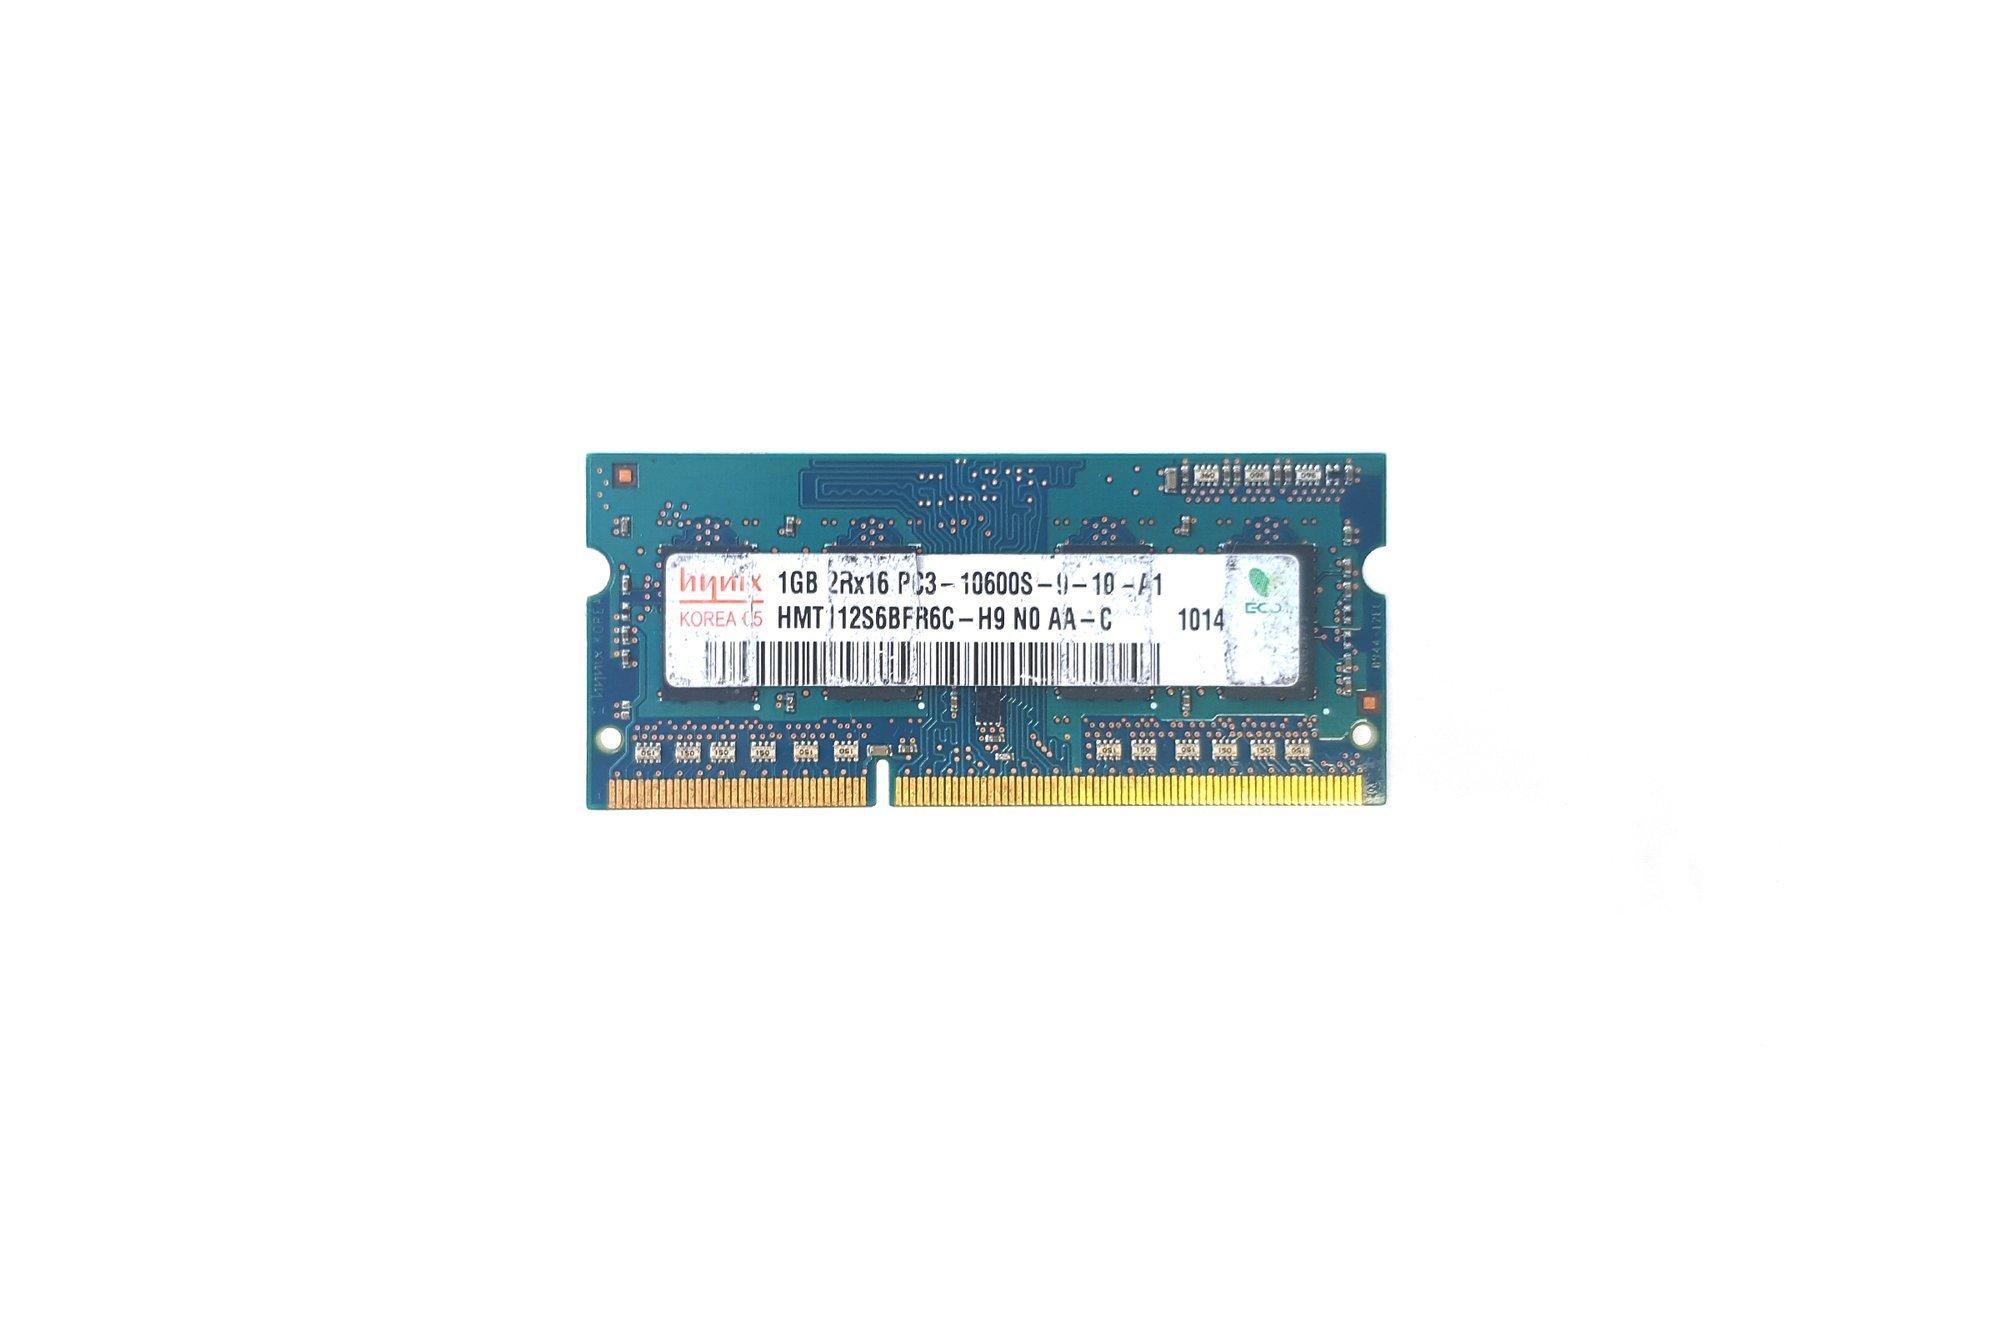 SODIMM Memory RAM Hynix 1GB DDR3 HMT112S6BFR6C-H9